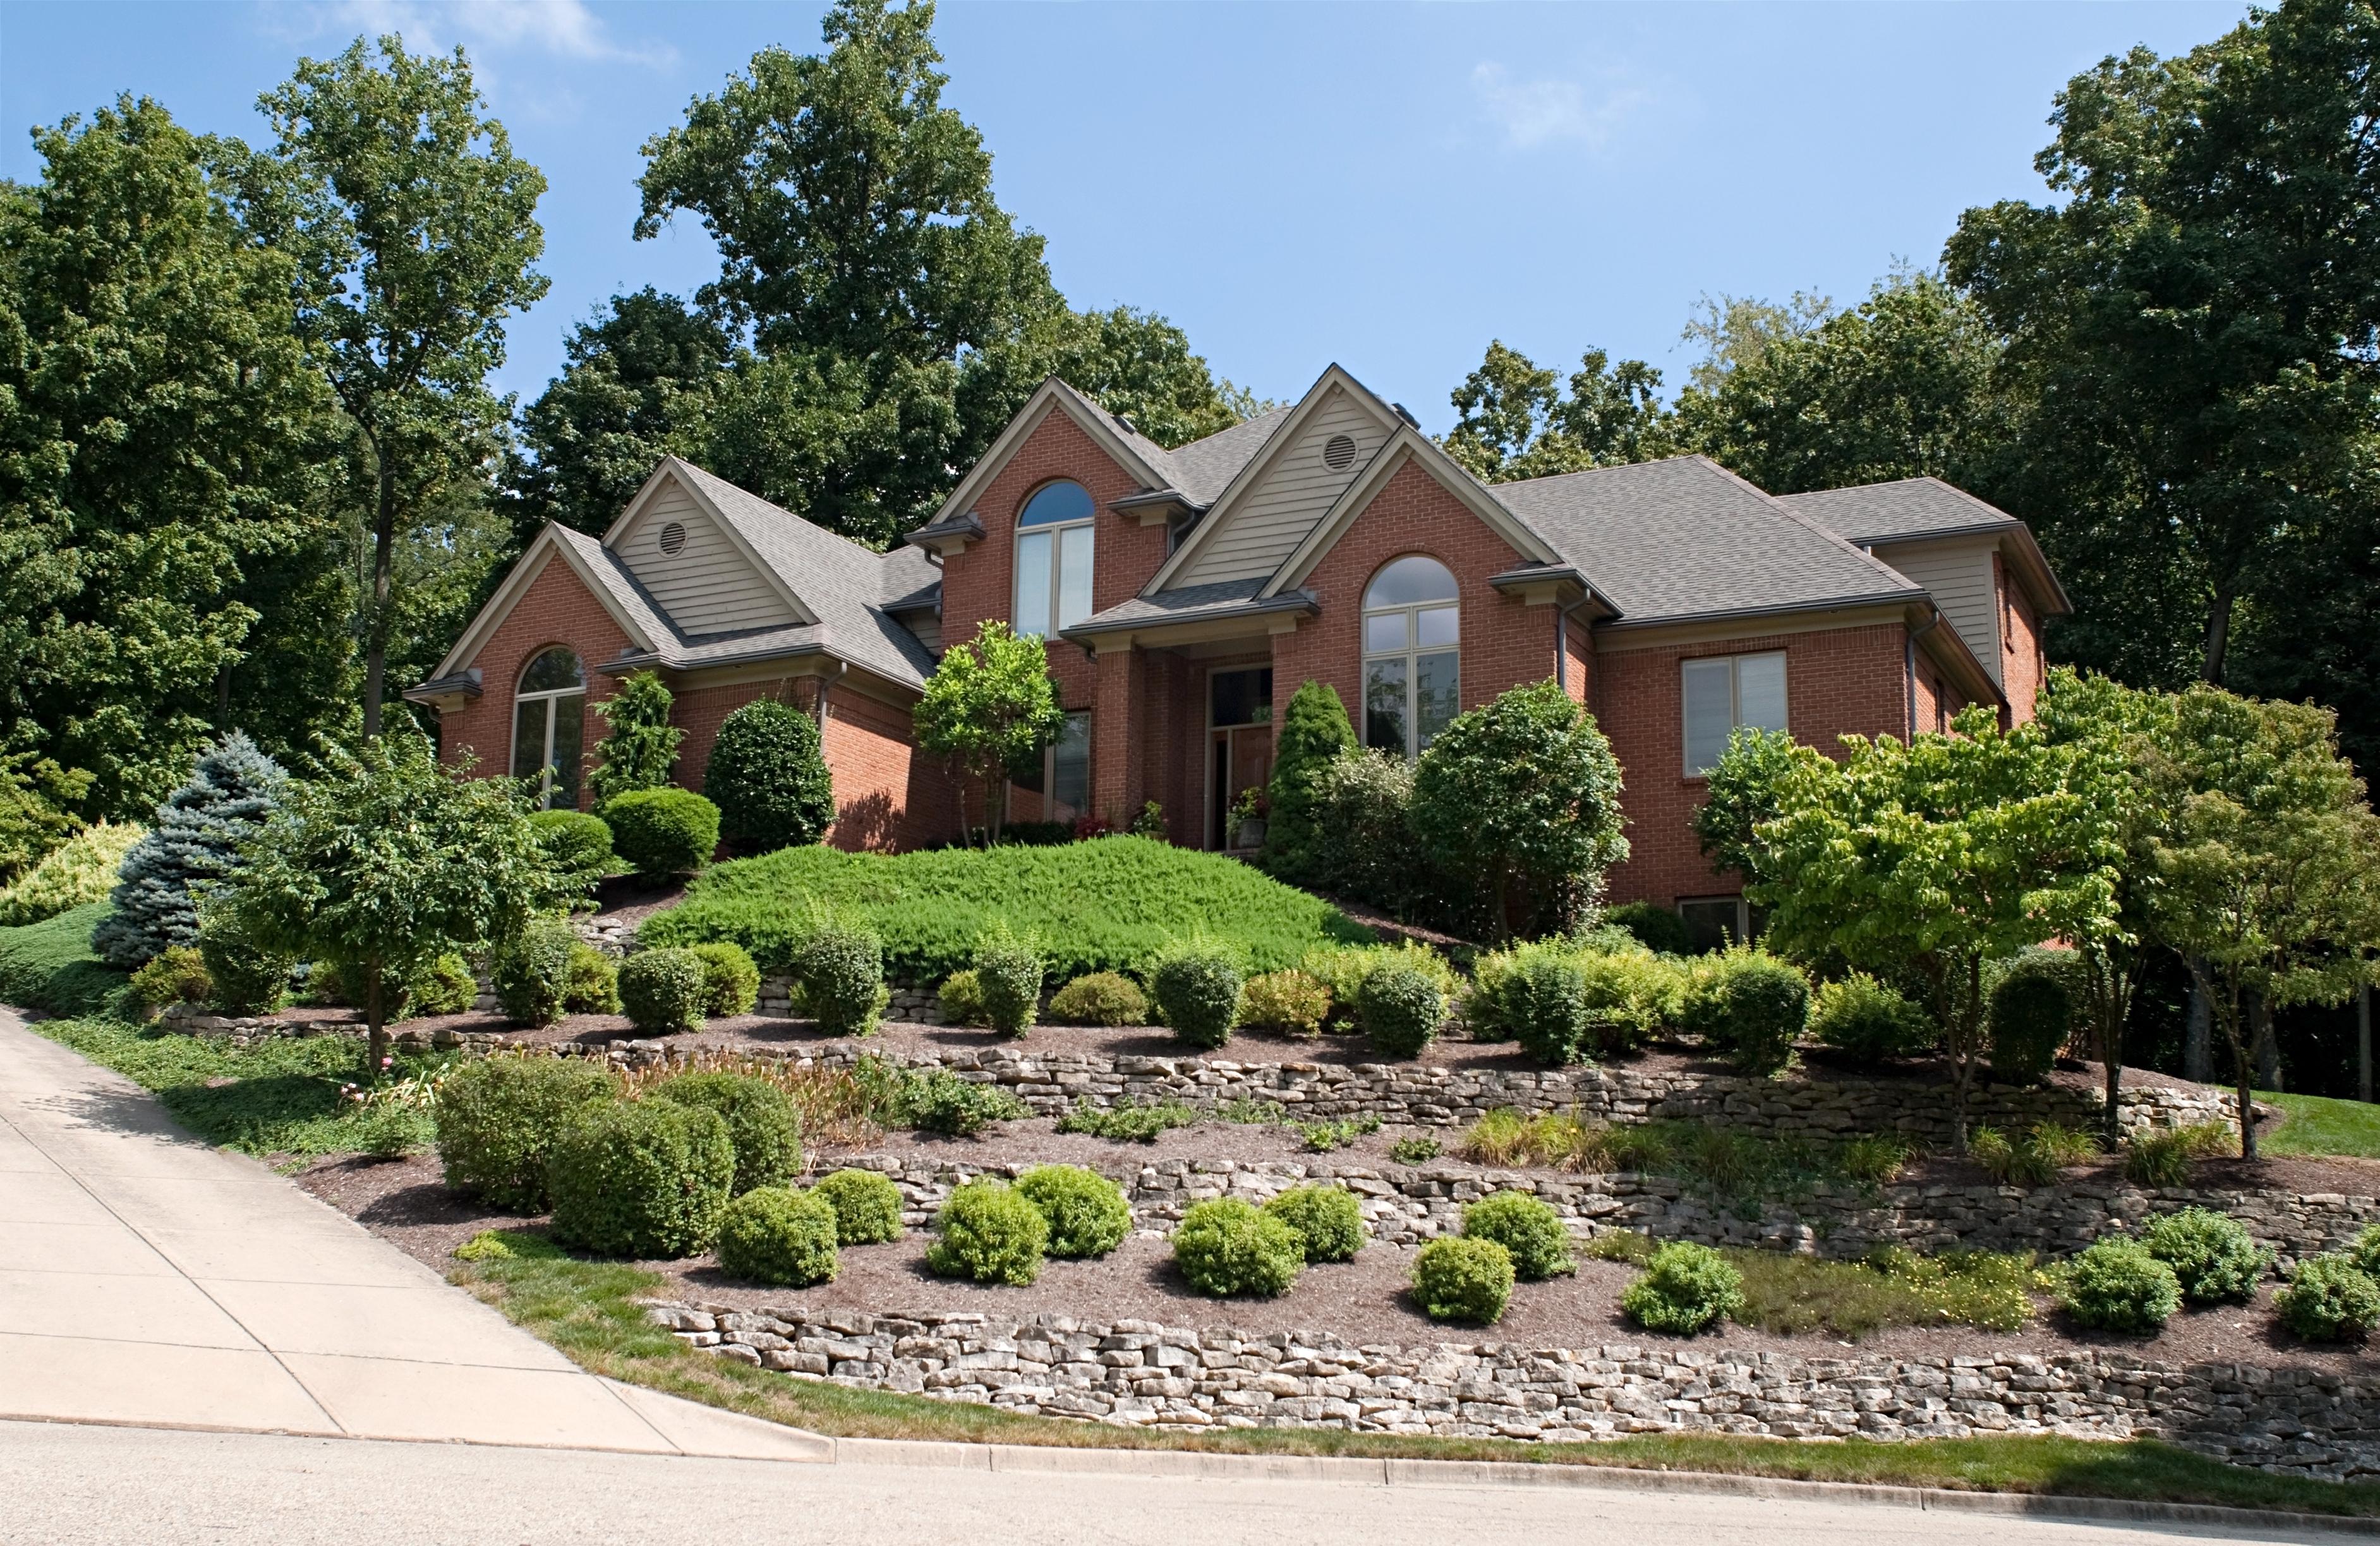 bigstock-Luxury-House-on-Hill-50818781